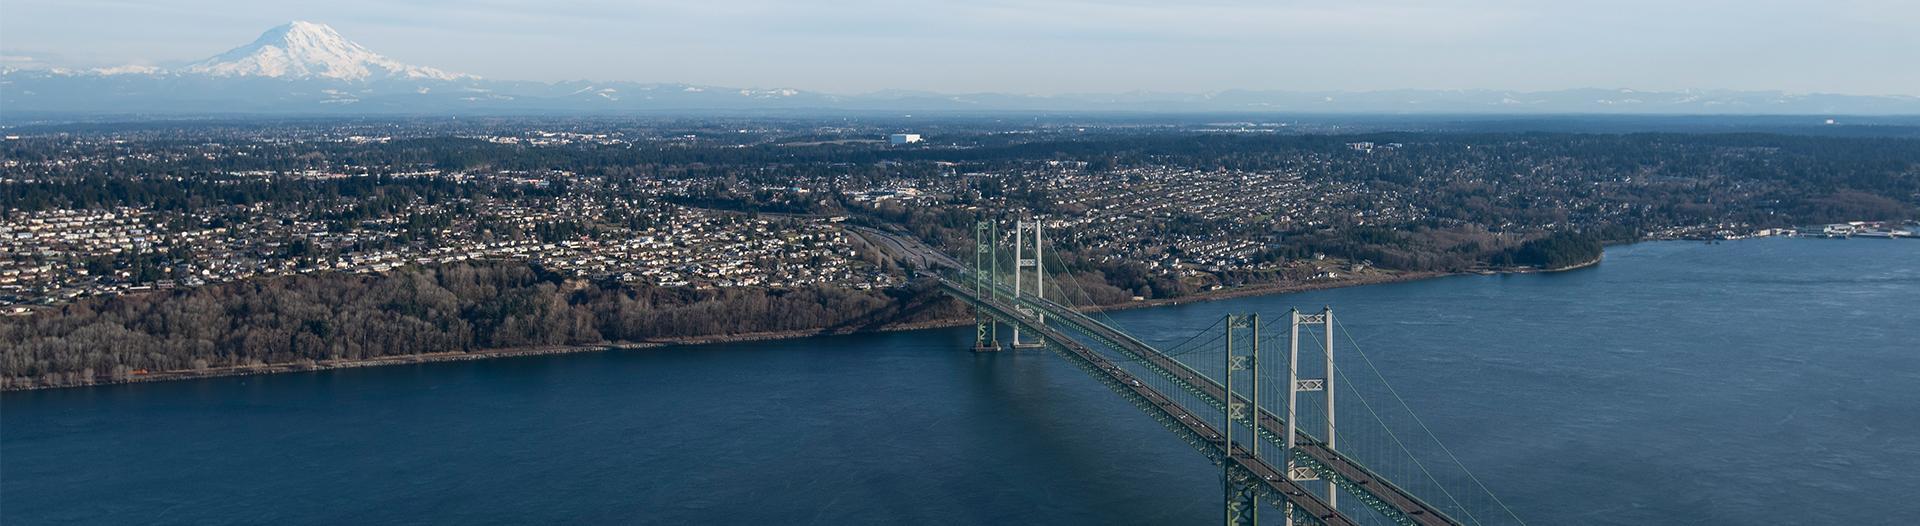 aerial photo of a bridge across water